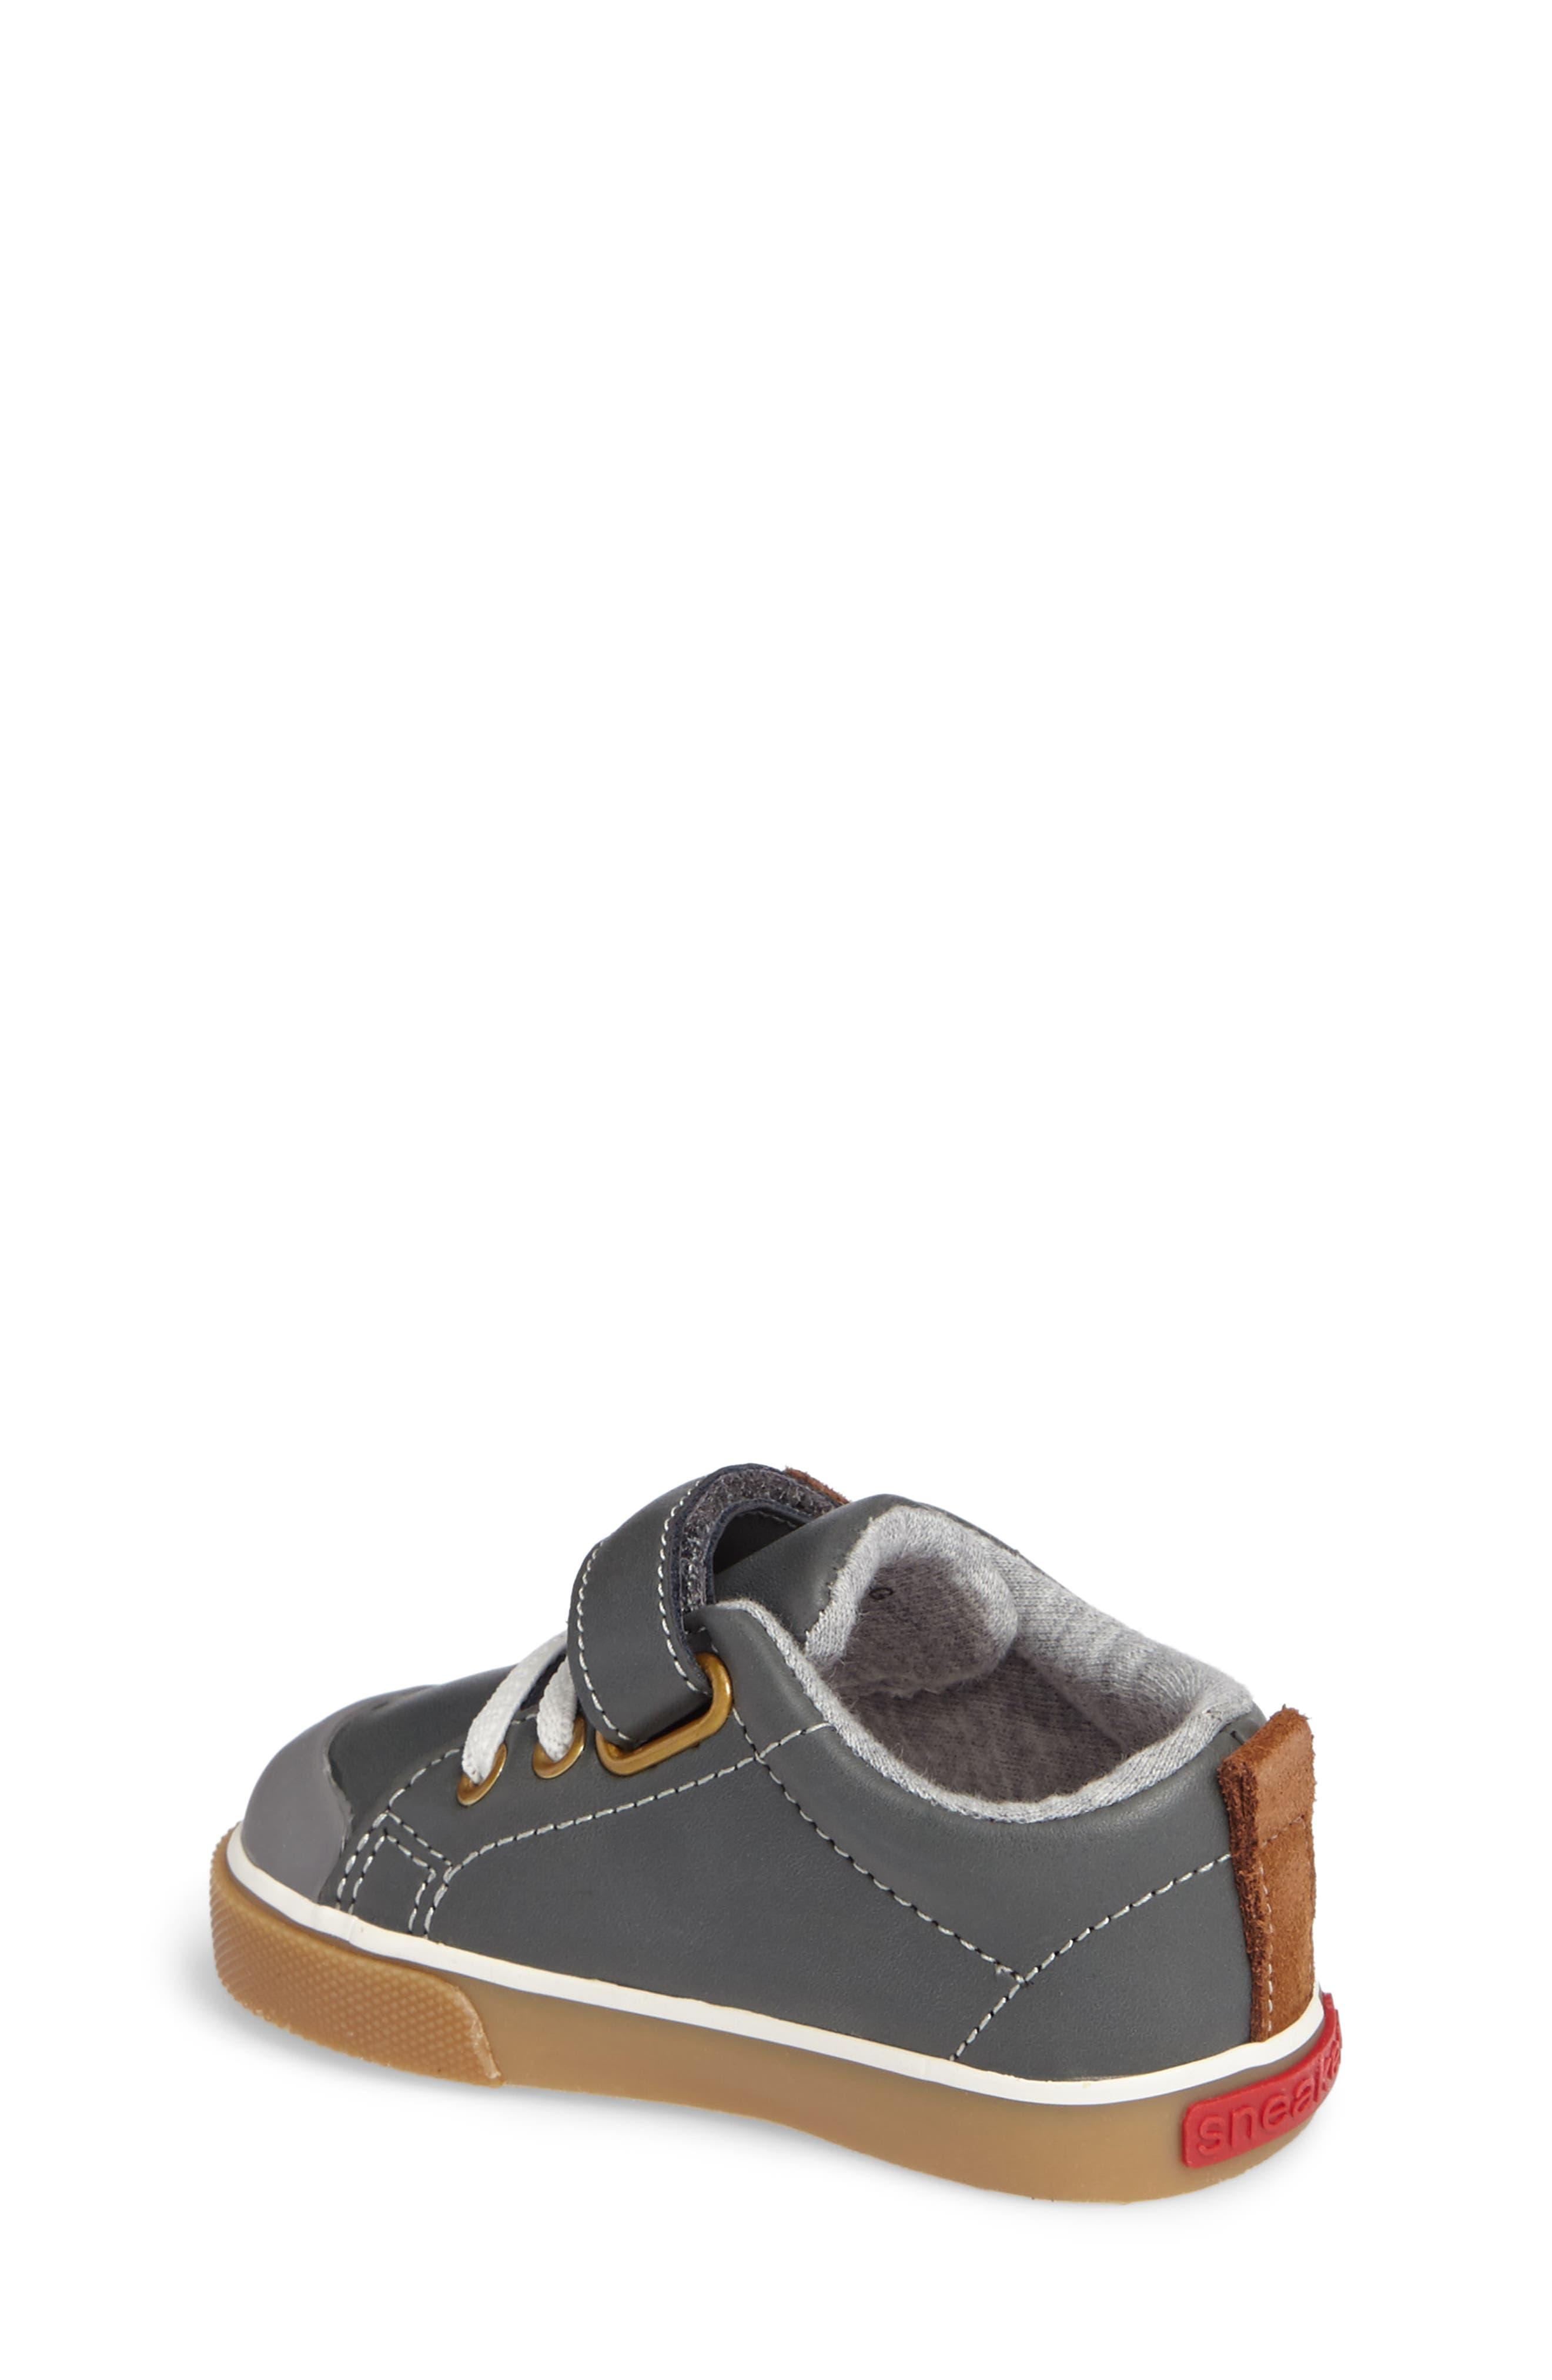 Stevie II Sneaker,                             Alternate thumbnail 2, color,                             GREY LEATHER